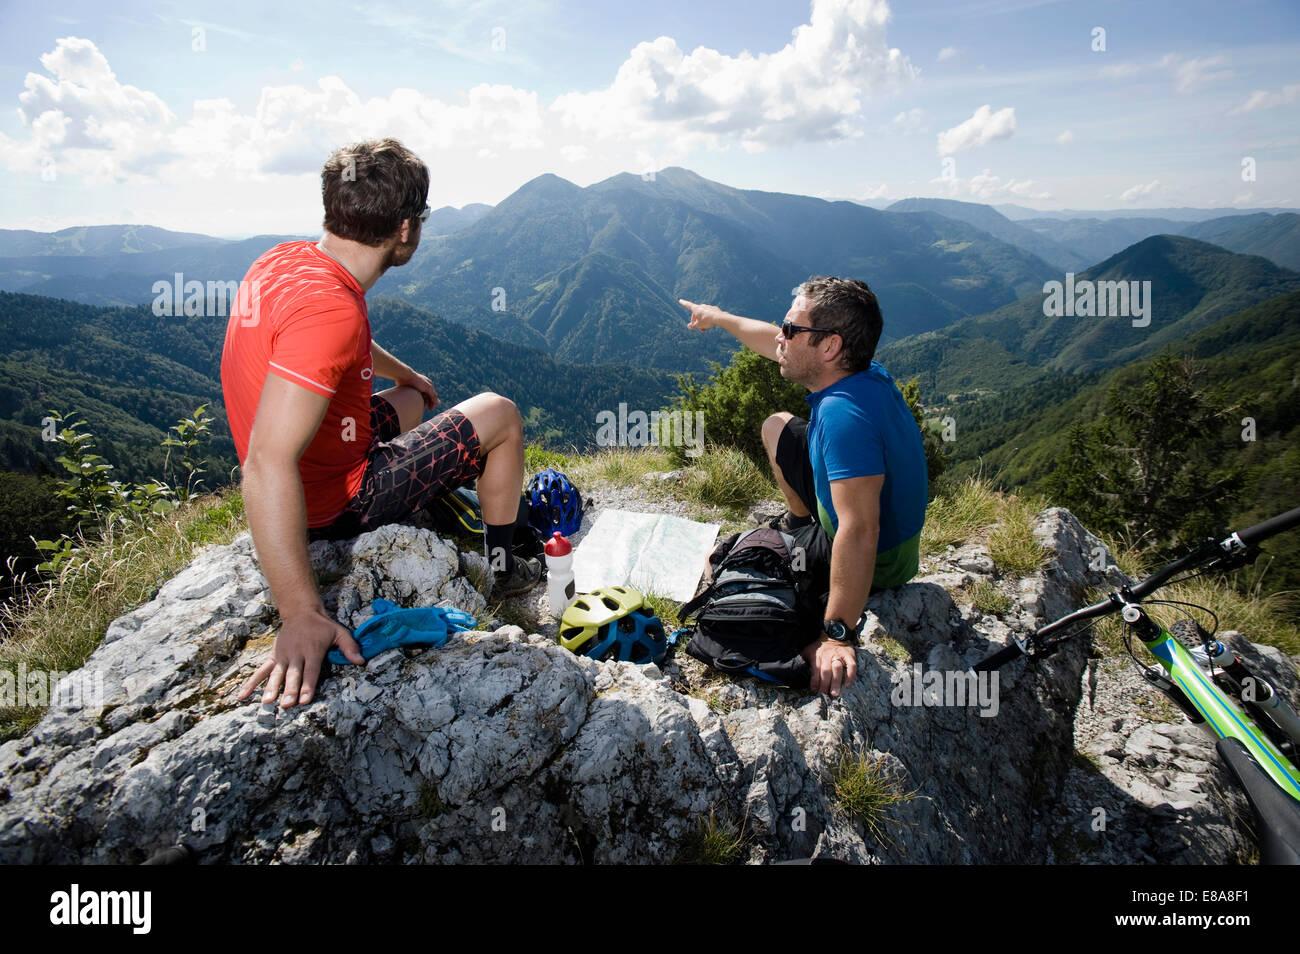 two mountain biker having a rest, Slatnik, Istria, Slovenia - Stock Image